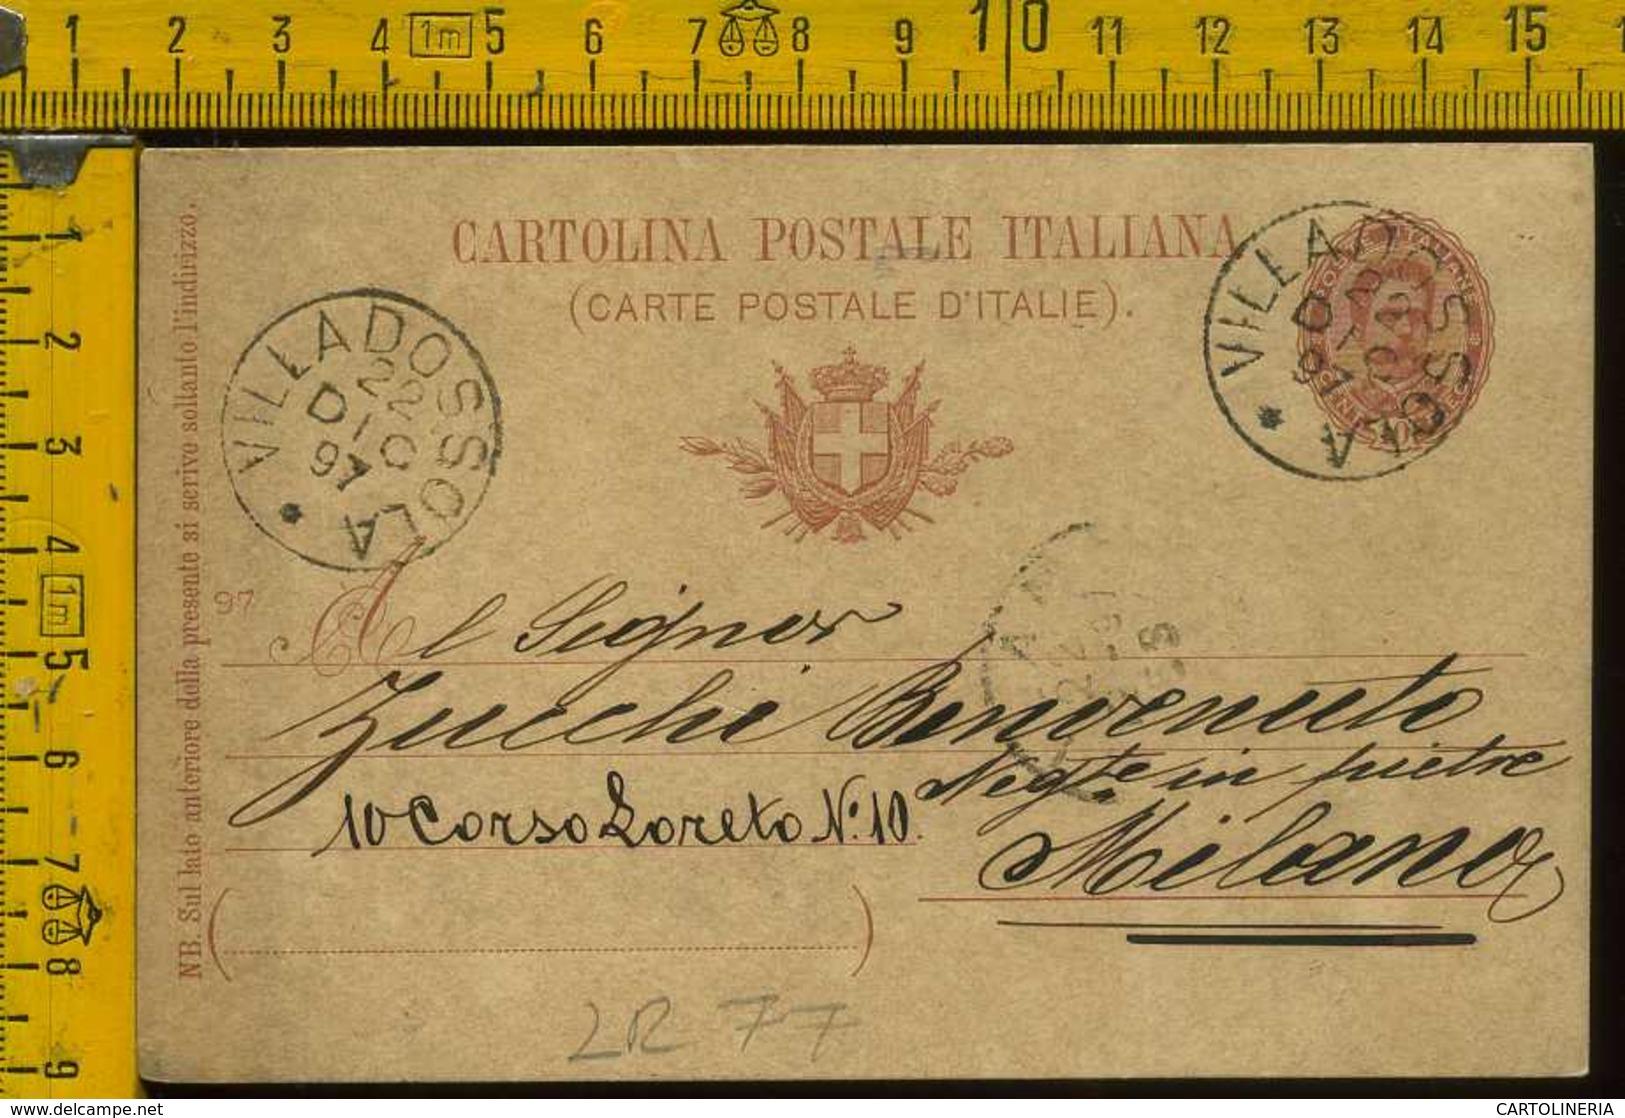 Regno Cartolina Intero Postale Villadossola Milano - Marcofilie